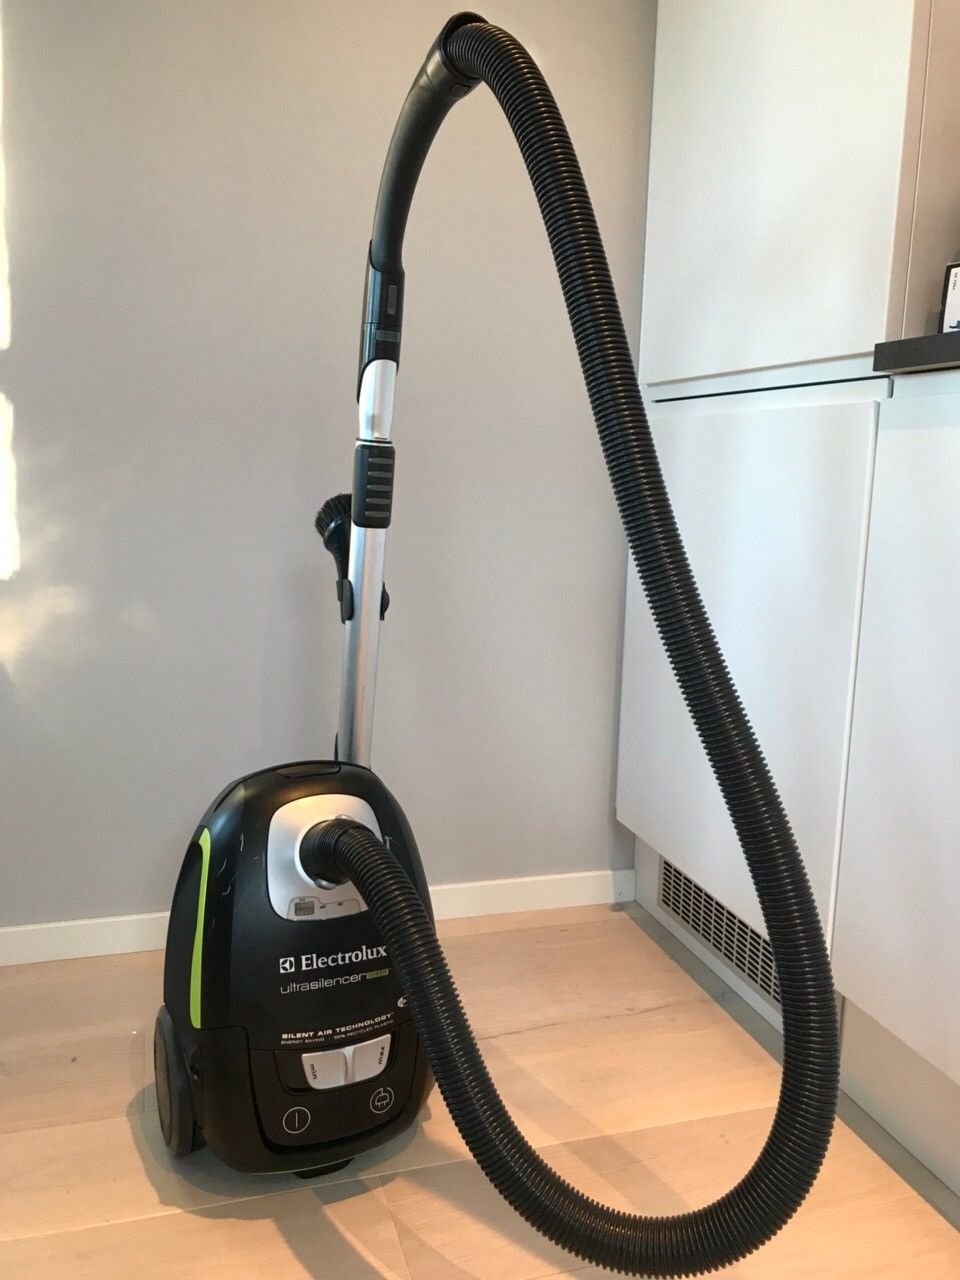 Electrolux Ultrasilencer Green - Oppegård  - Pent brukt Electrolux støvsuger selges da vi har flyttet i hus med sentralstøvsuger. Følger med noen poser.   - Oppegård